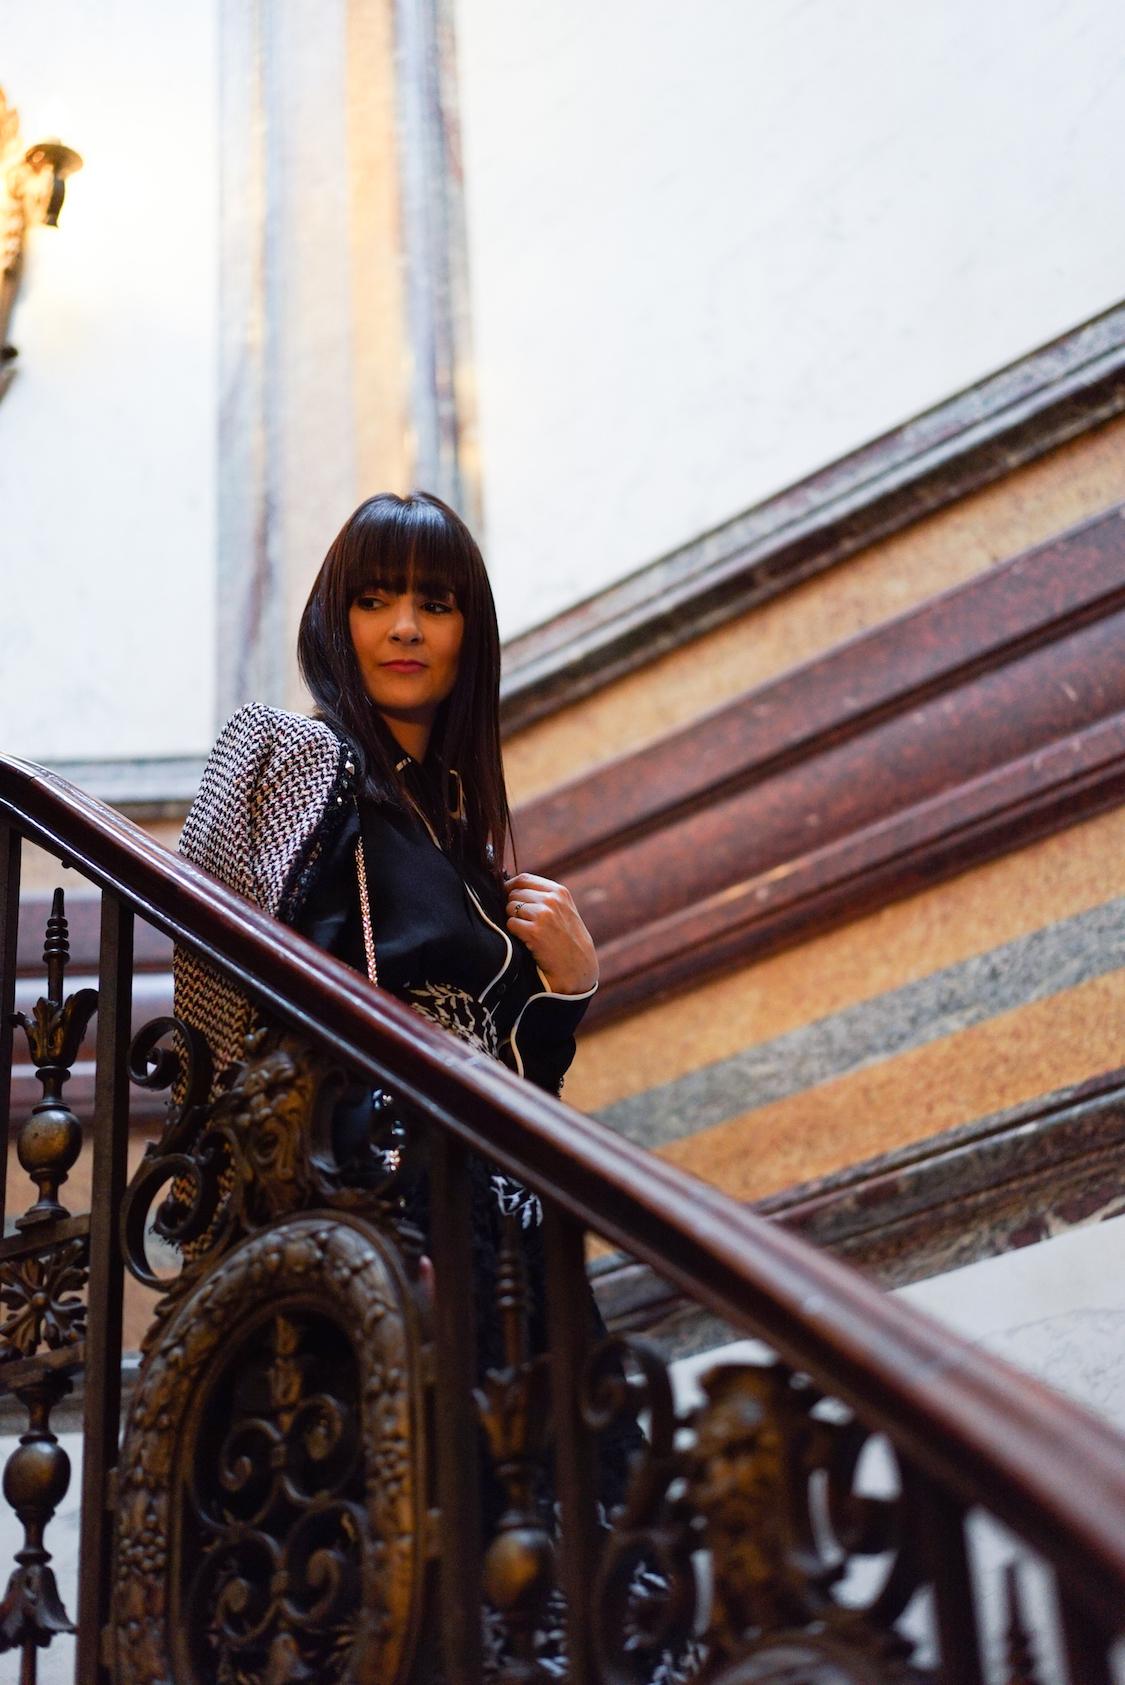 look-paris-fashion-week-re-see-valentino-2015-danielle-noce-2